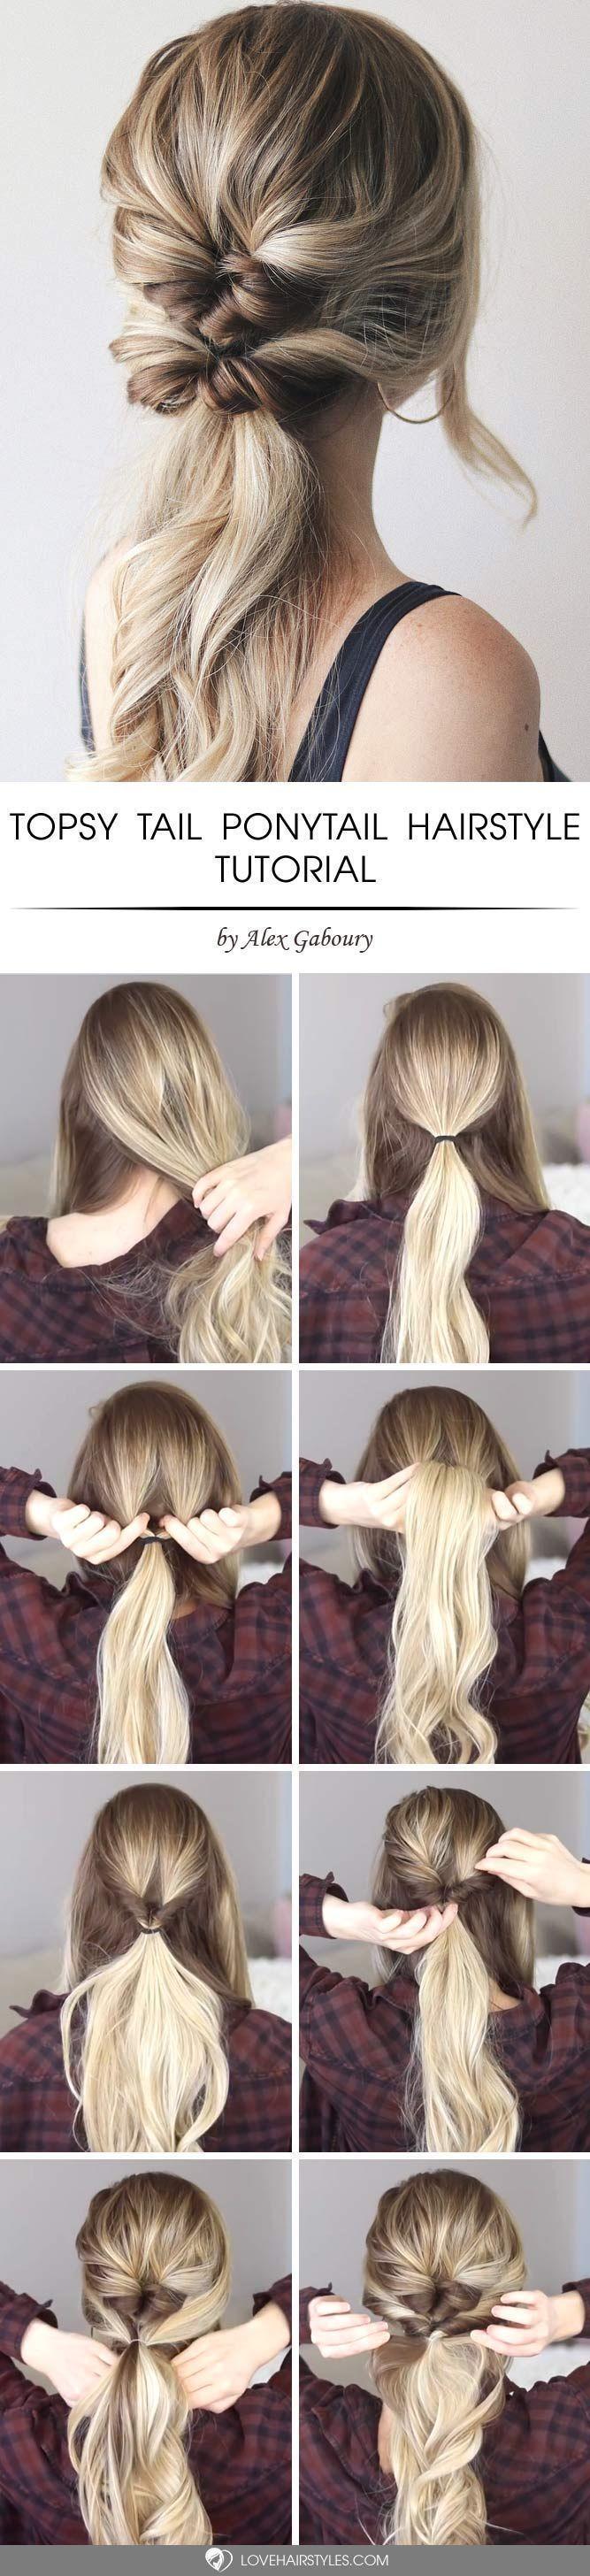 Hair Styles For School Easy And Chic Double Topsy Tail Hairstyle Topsytail Tutorials Hair Koreanische Haarfarbe Pferdeschwanz Frisuren Tutorial Haartutorial